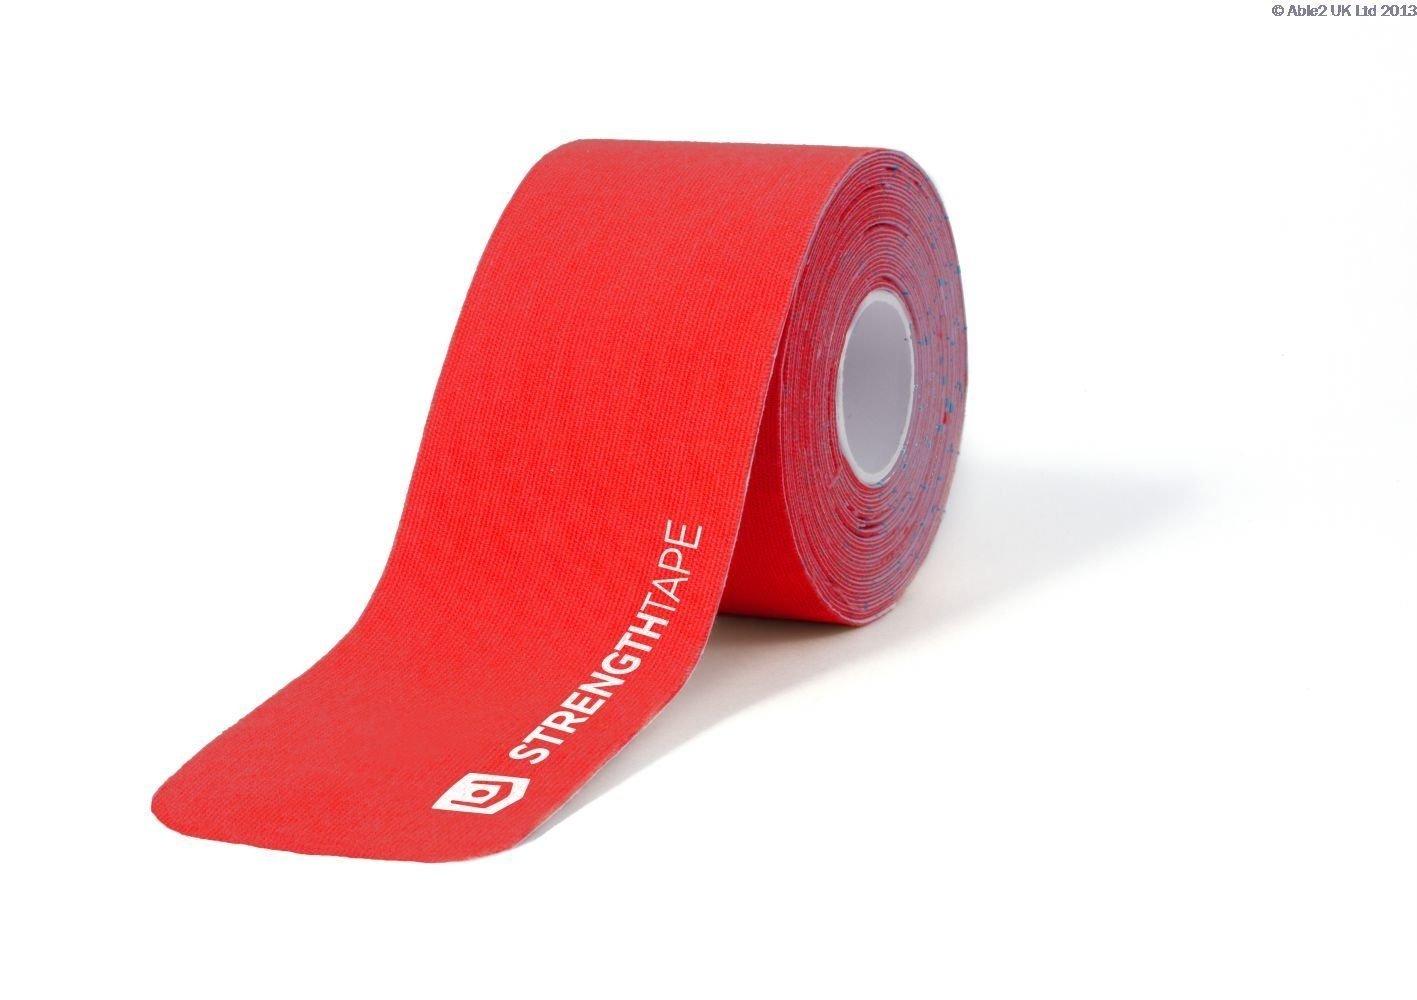 "StrengthTape Kinesiology Tape - 16.4' (5m) Roll of 10"" Precut Strips (2 Pack)"